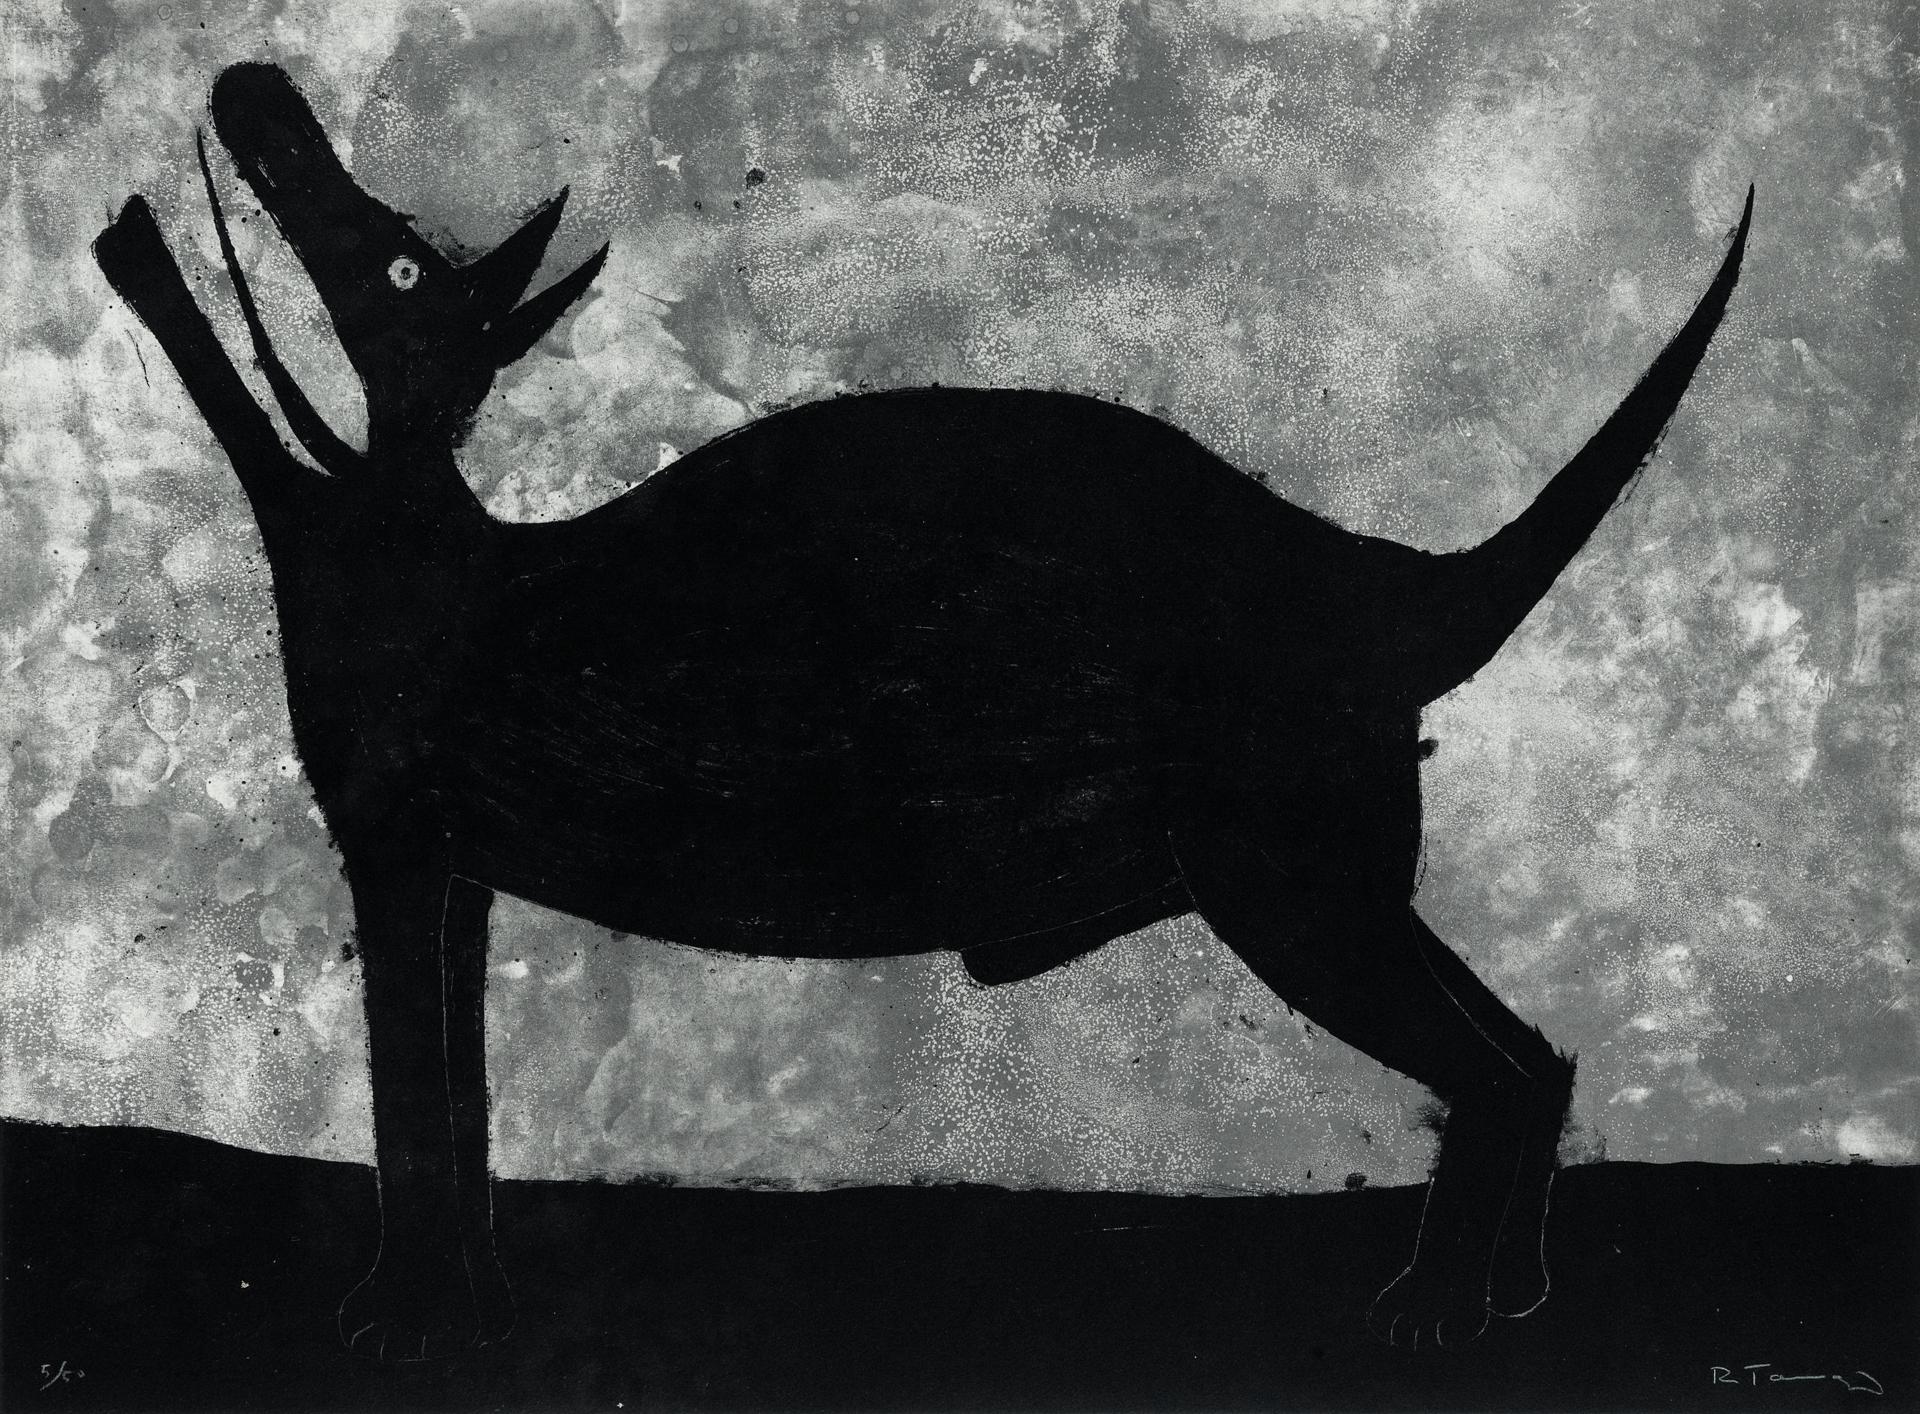 Perro by Rufino Tamayo (1899 - 1991)